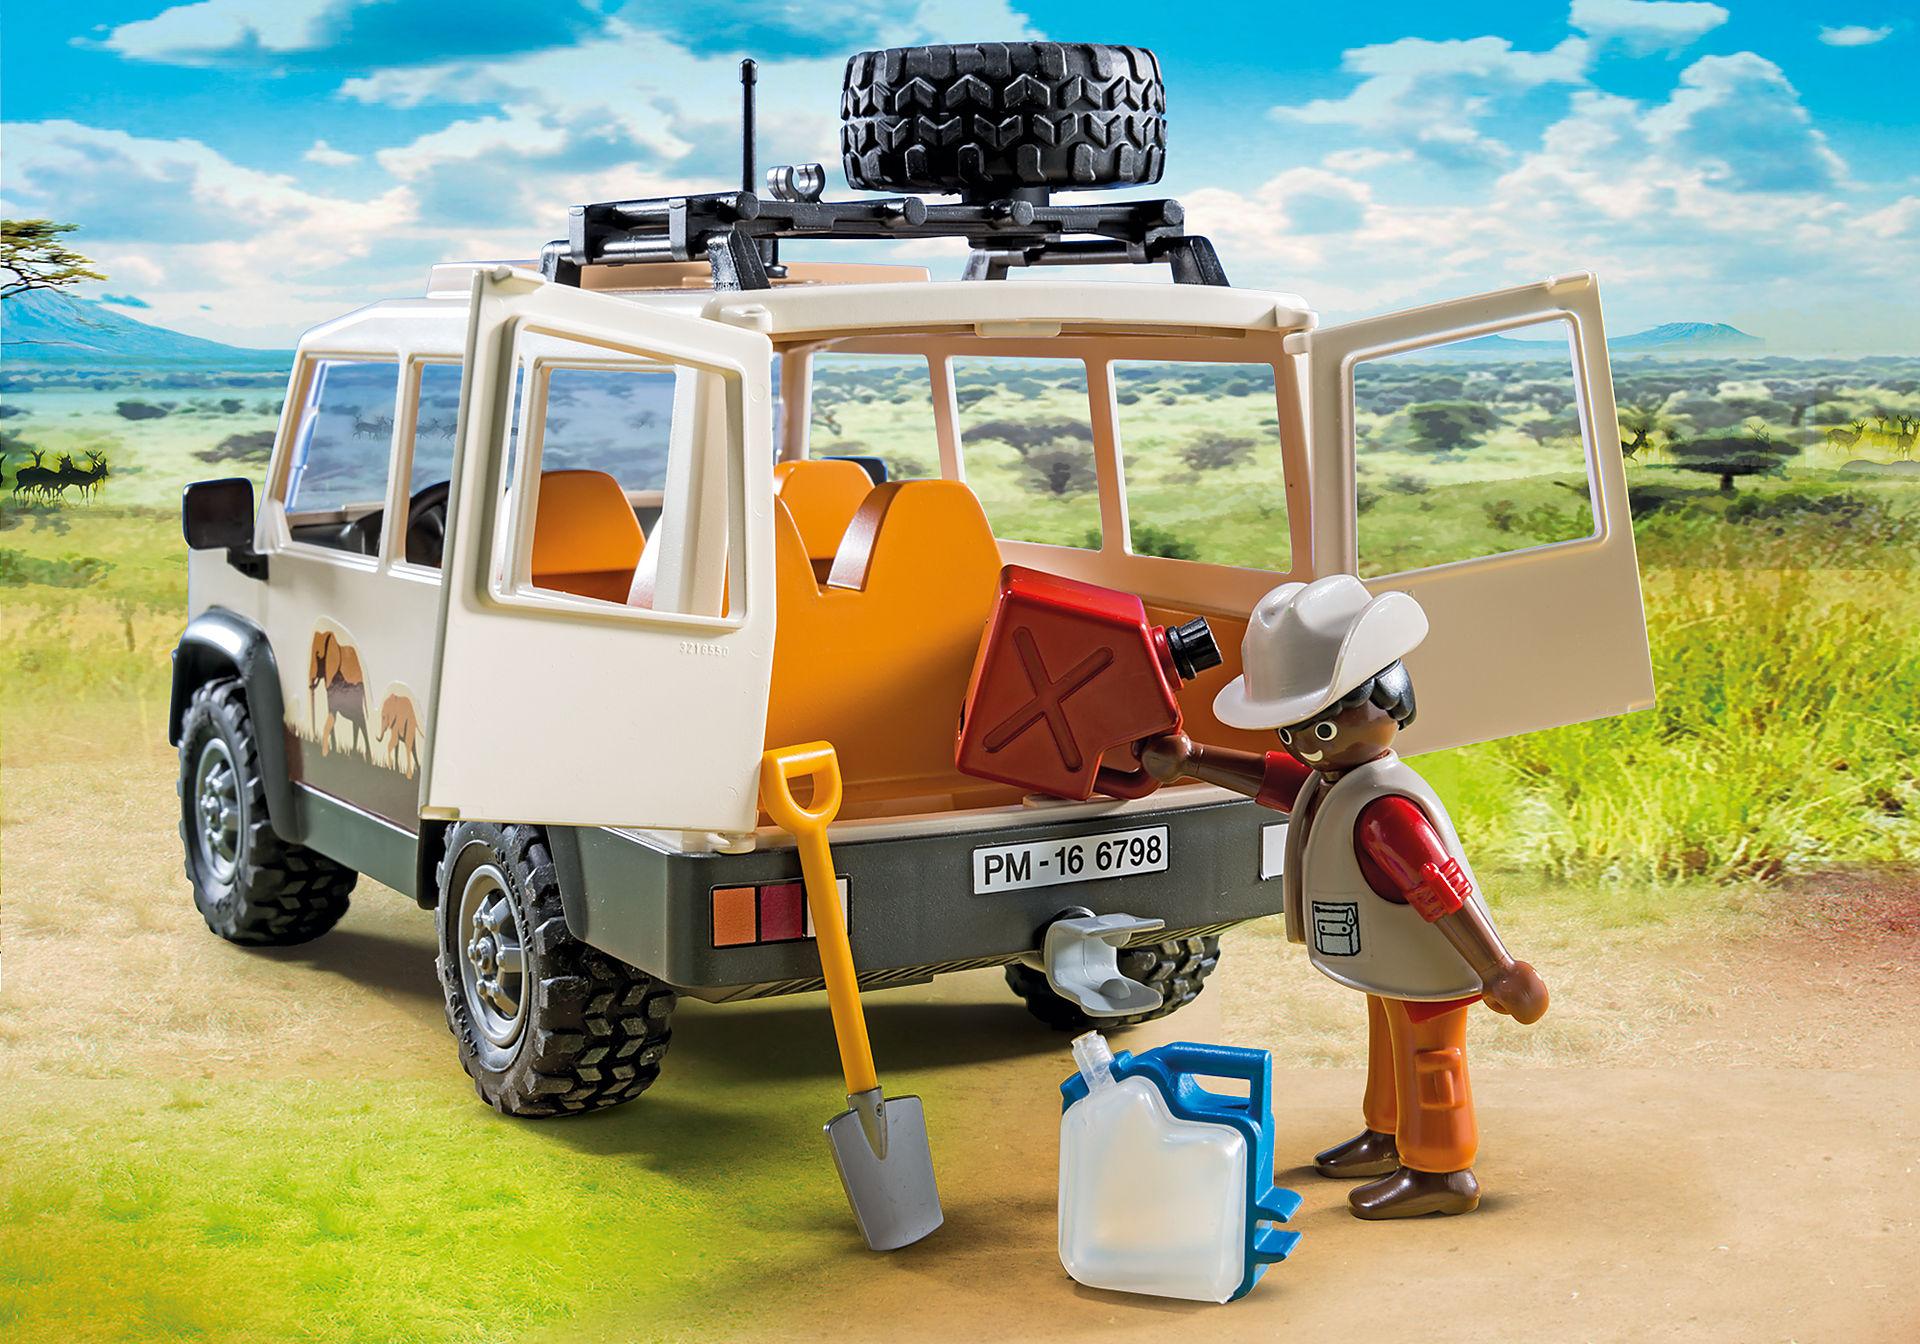 http://media.playmobil.com/i/playmobil/6798_product_extra2/Safari-Geländewagen mit Seilwinde